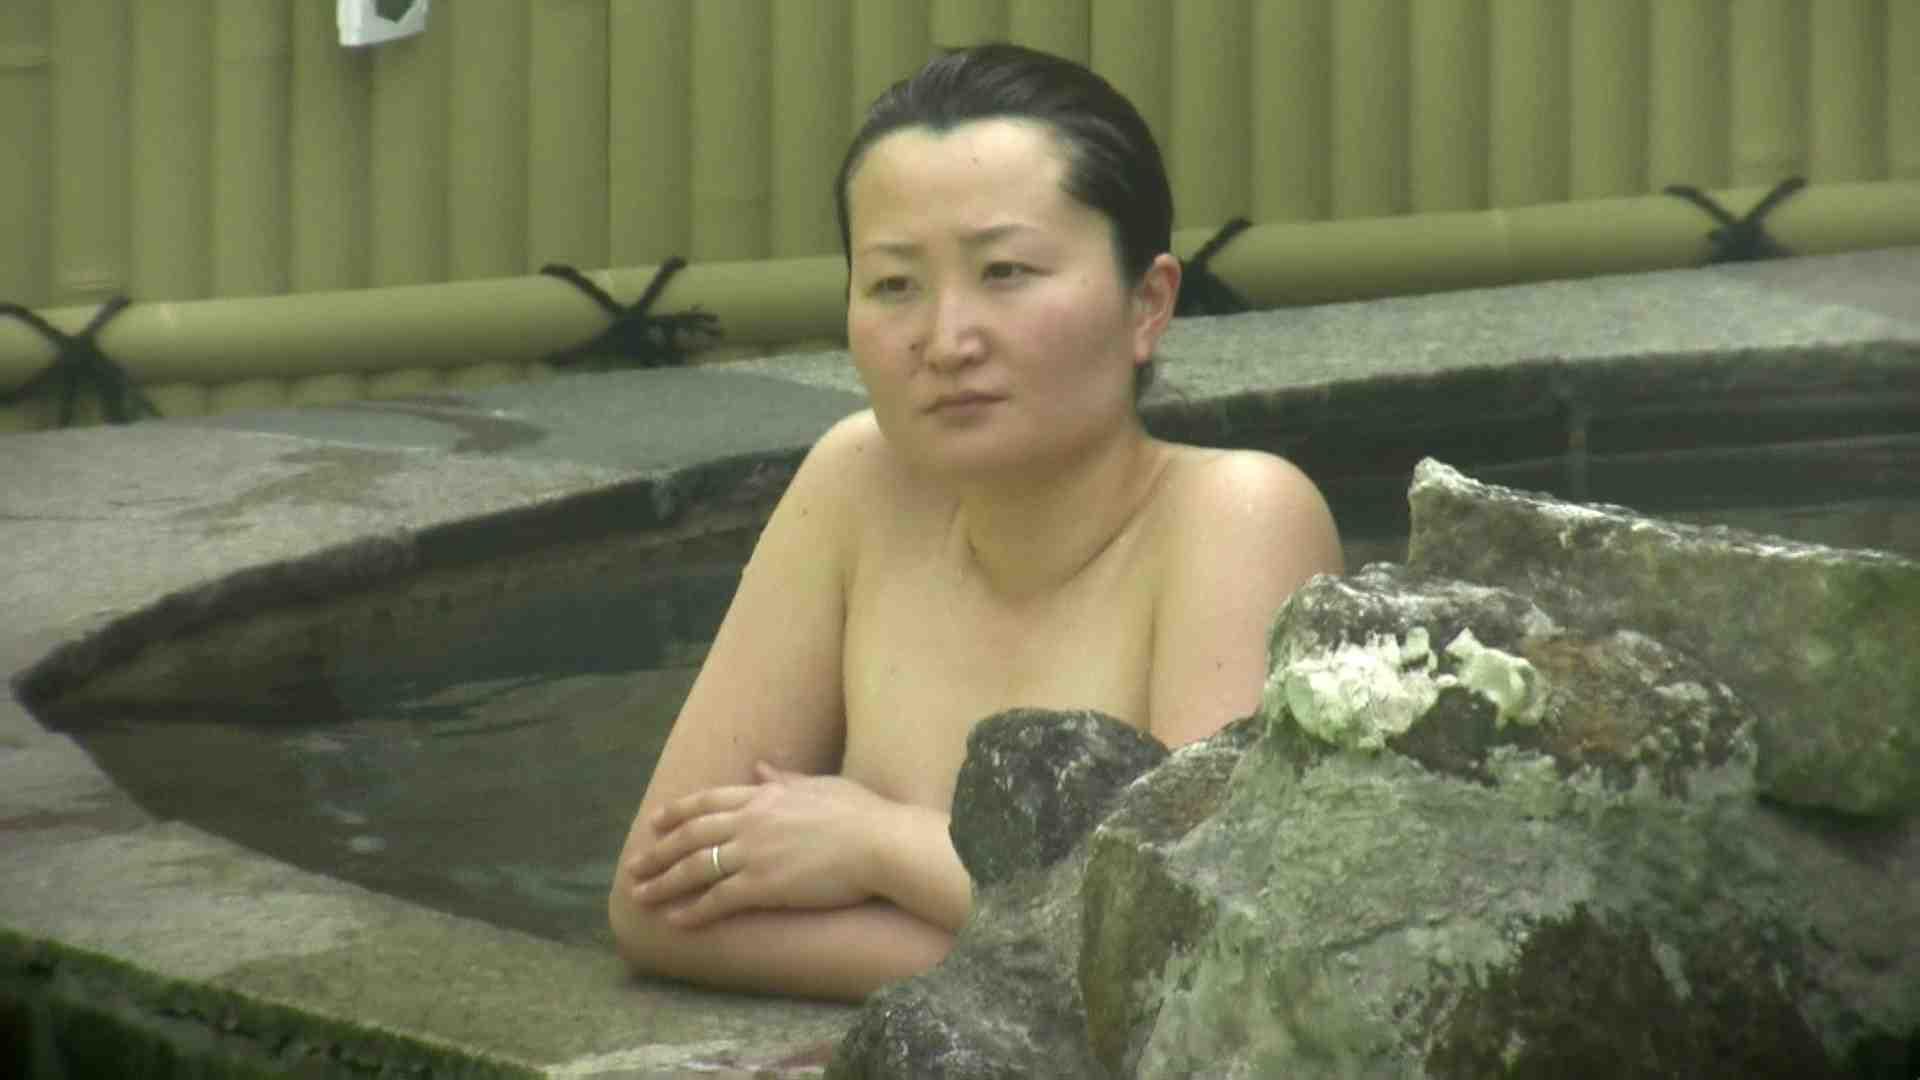 Aquaな露天風呂Vol.632 露天 戯れ無修正画像 70画像 68